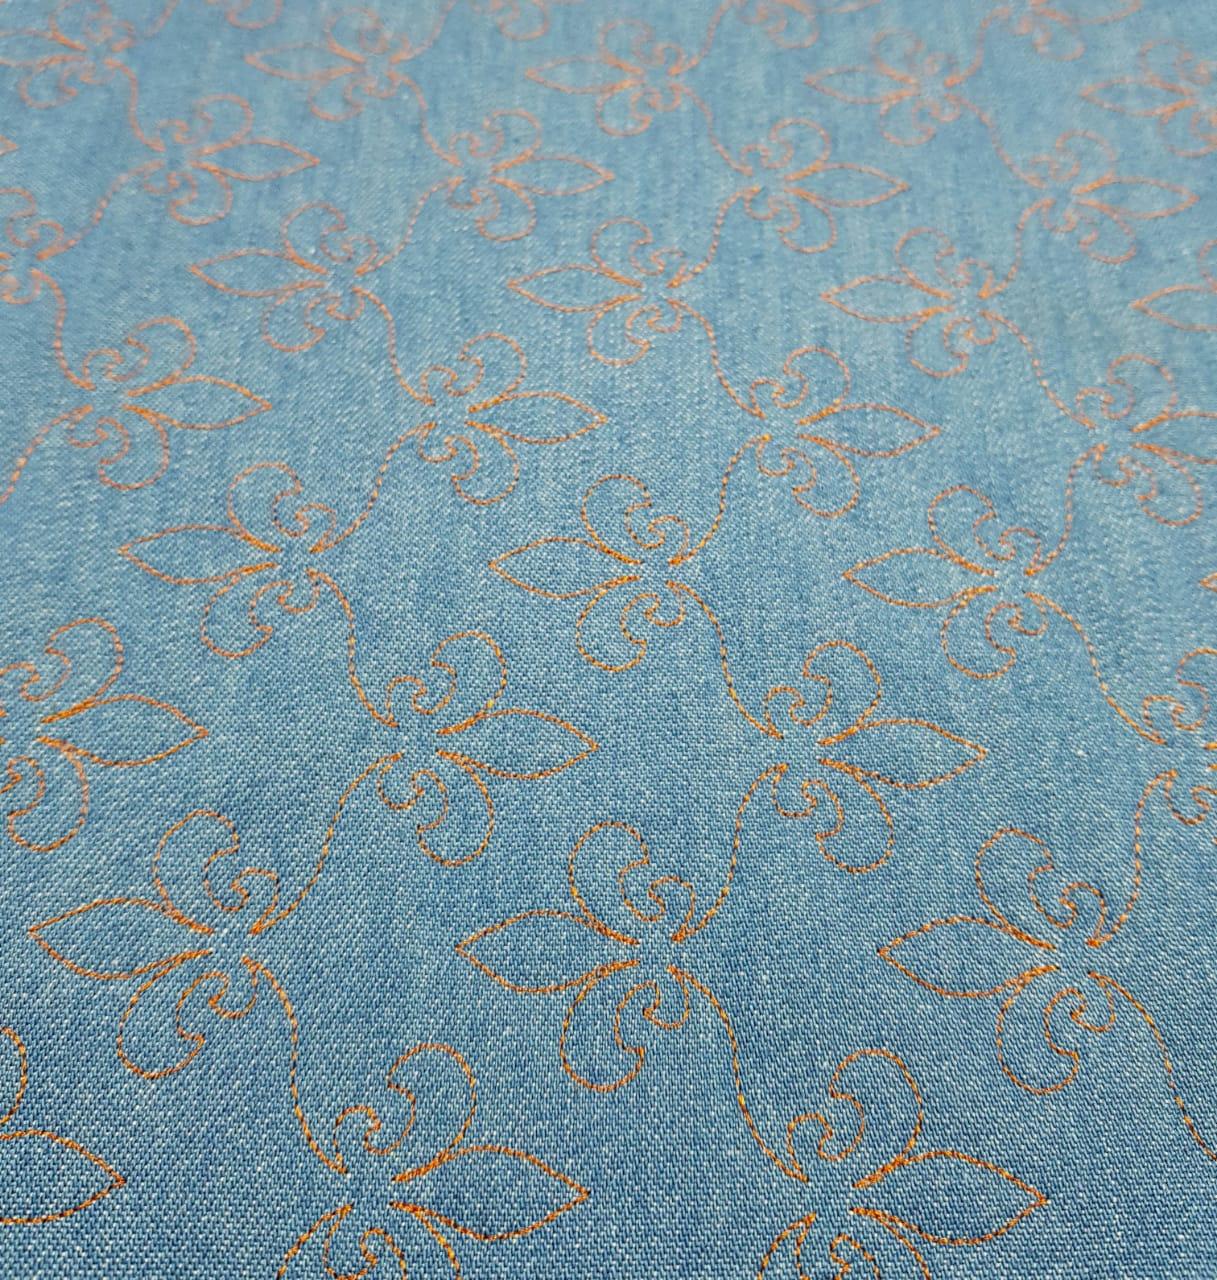 Jeans claro Matelassado - Flor de lis - 0,50cm x 1,50m